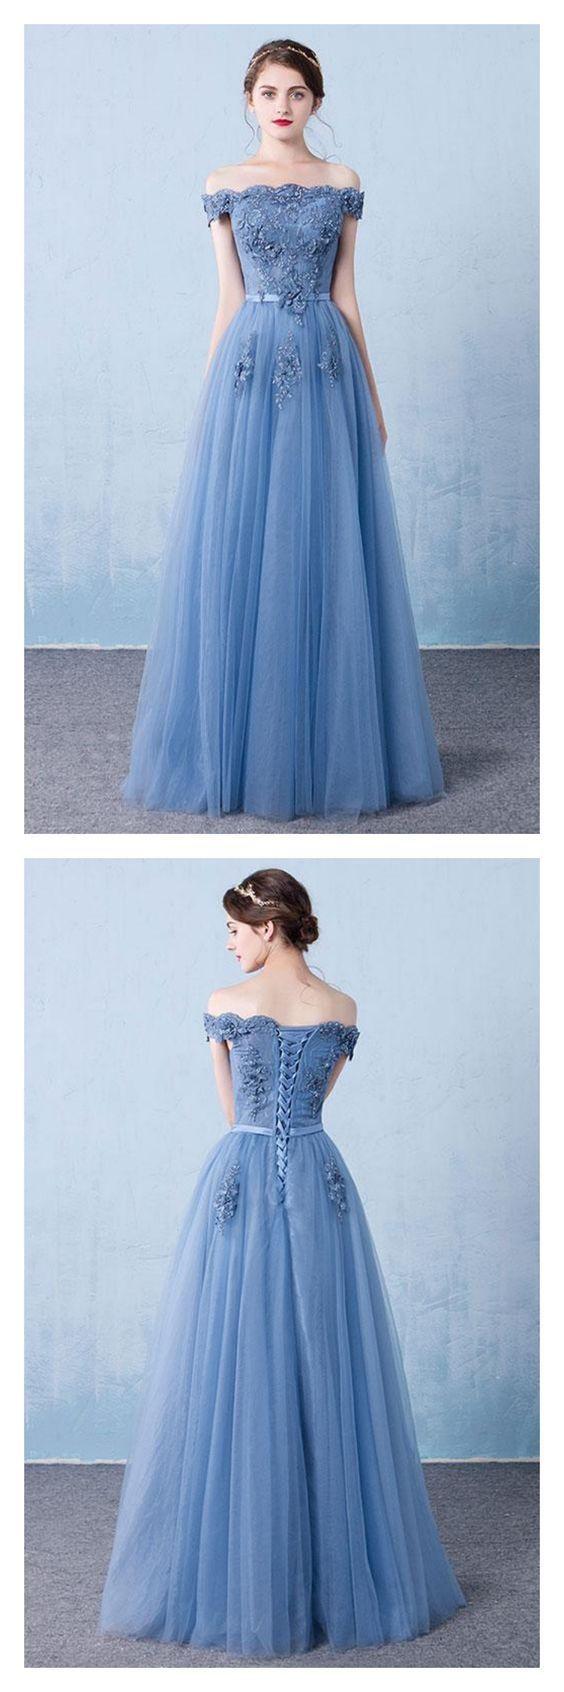 Elegant Off Shoulder Evening Dress, Long Tulle Prom Dresses,Party Dress With Applique